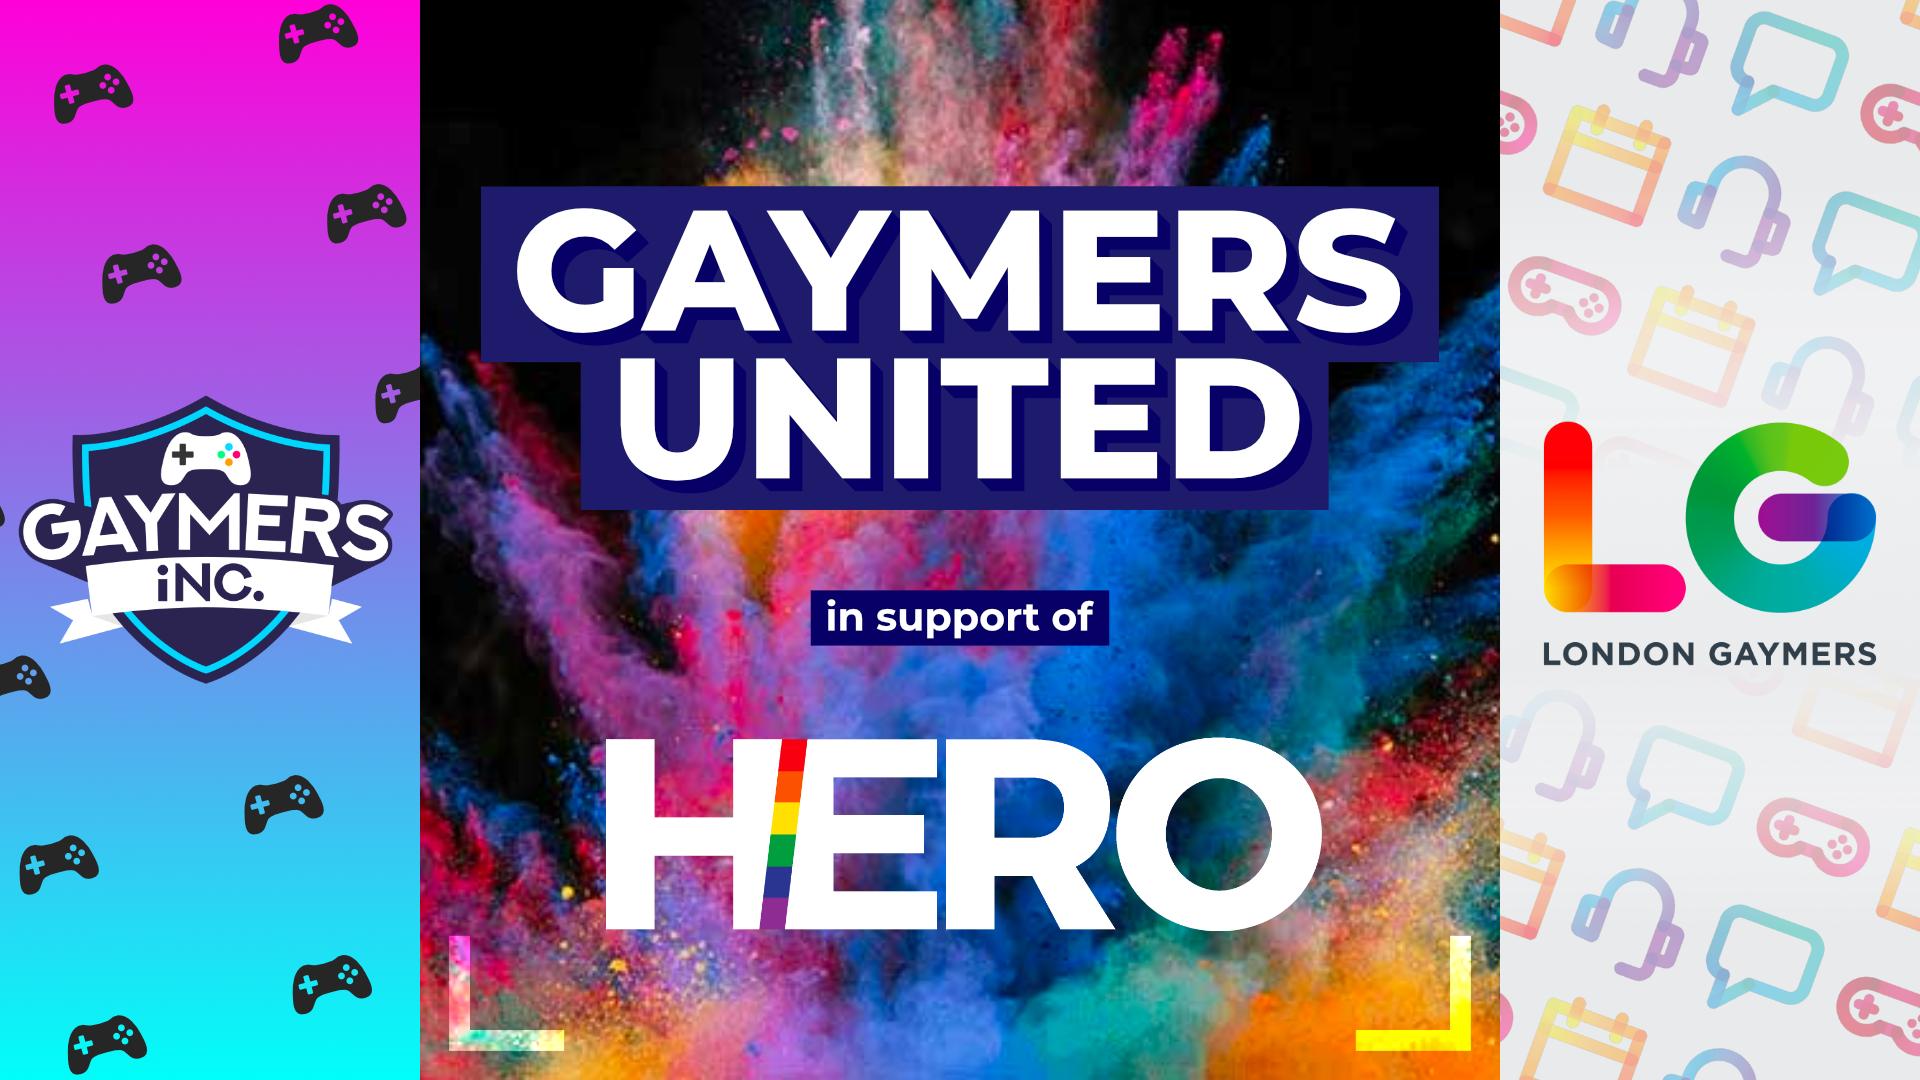 Gaymers United